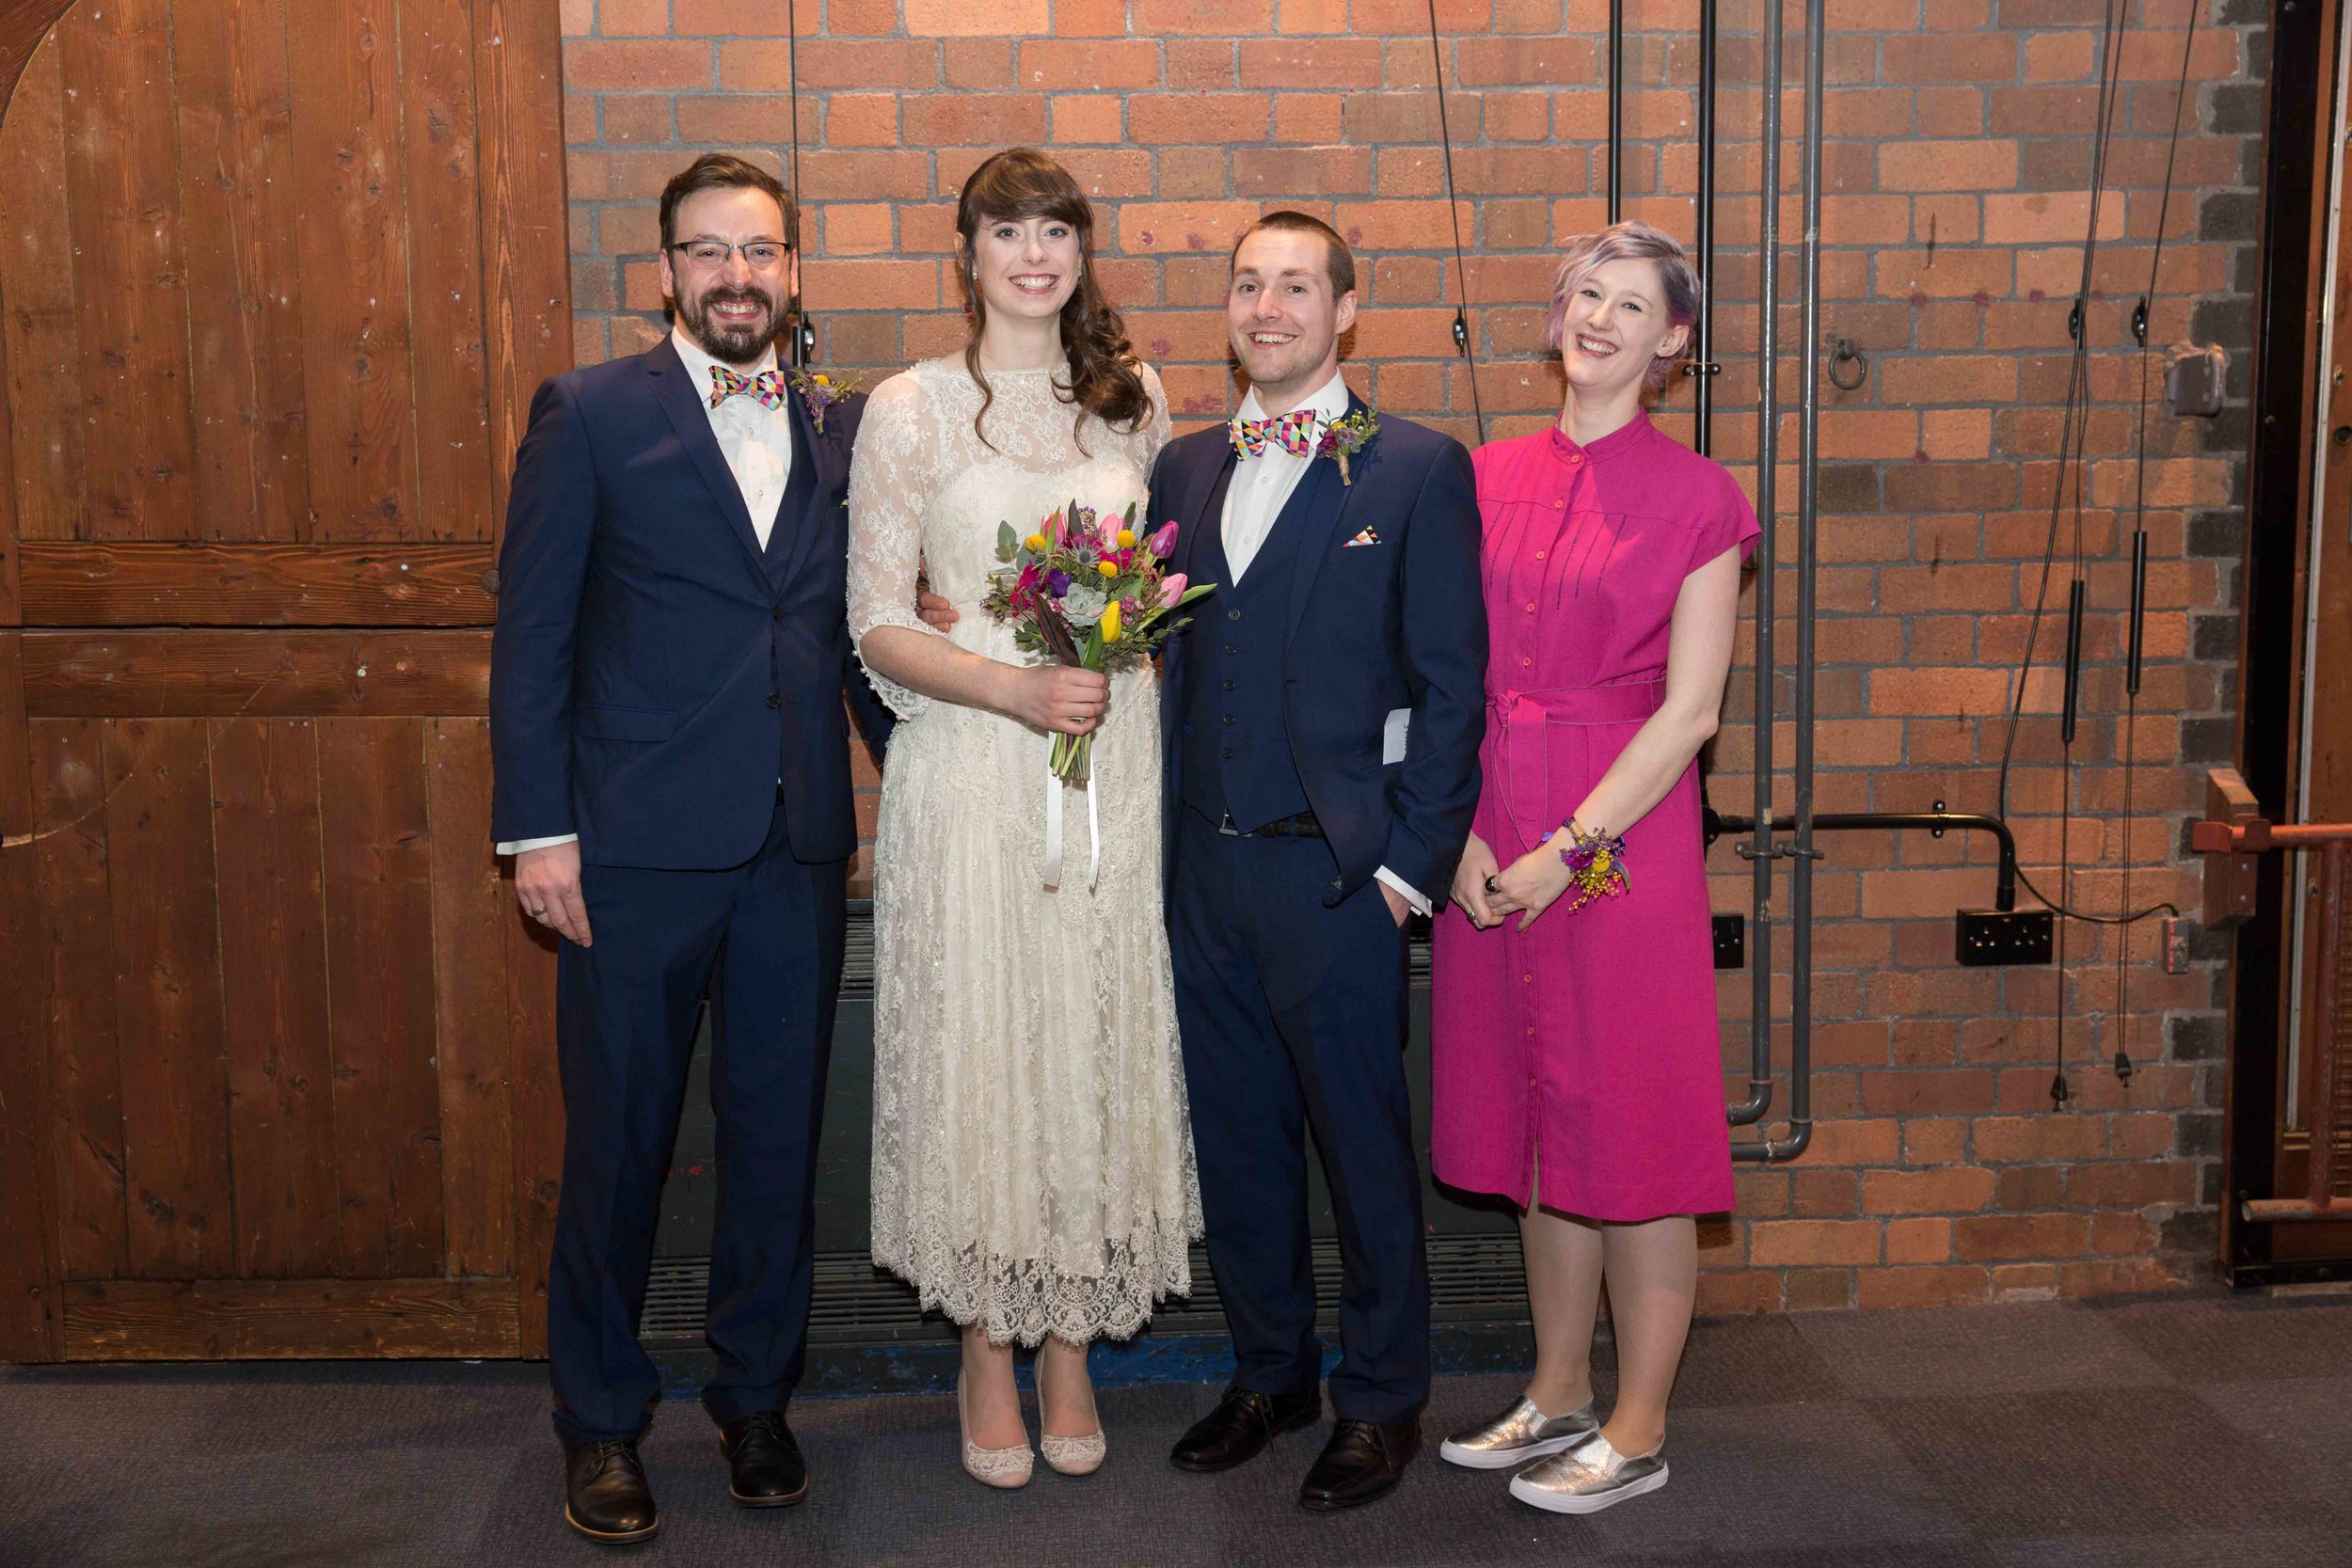 Adam & Faye - Wright Wedding Photography - Bristol Wedding Photographer -229.jpg